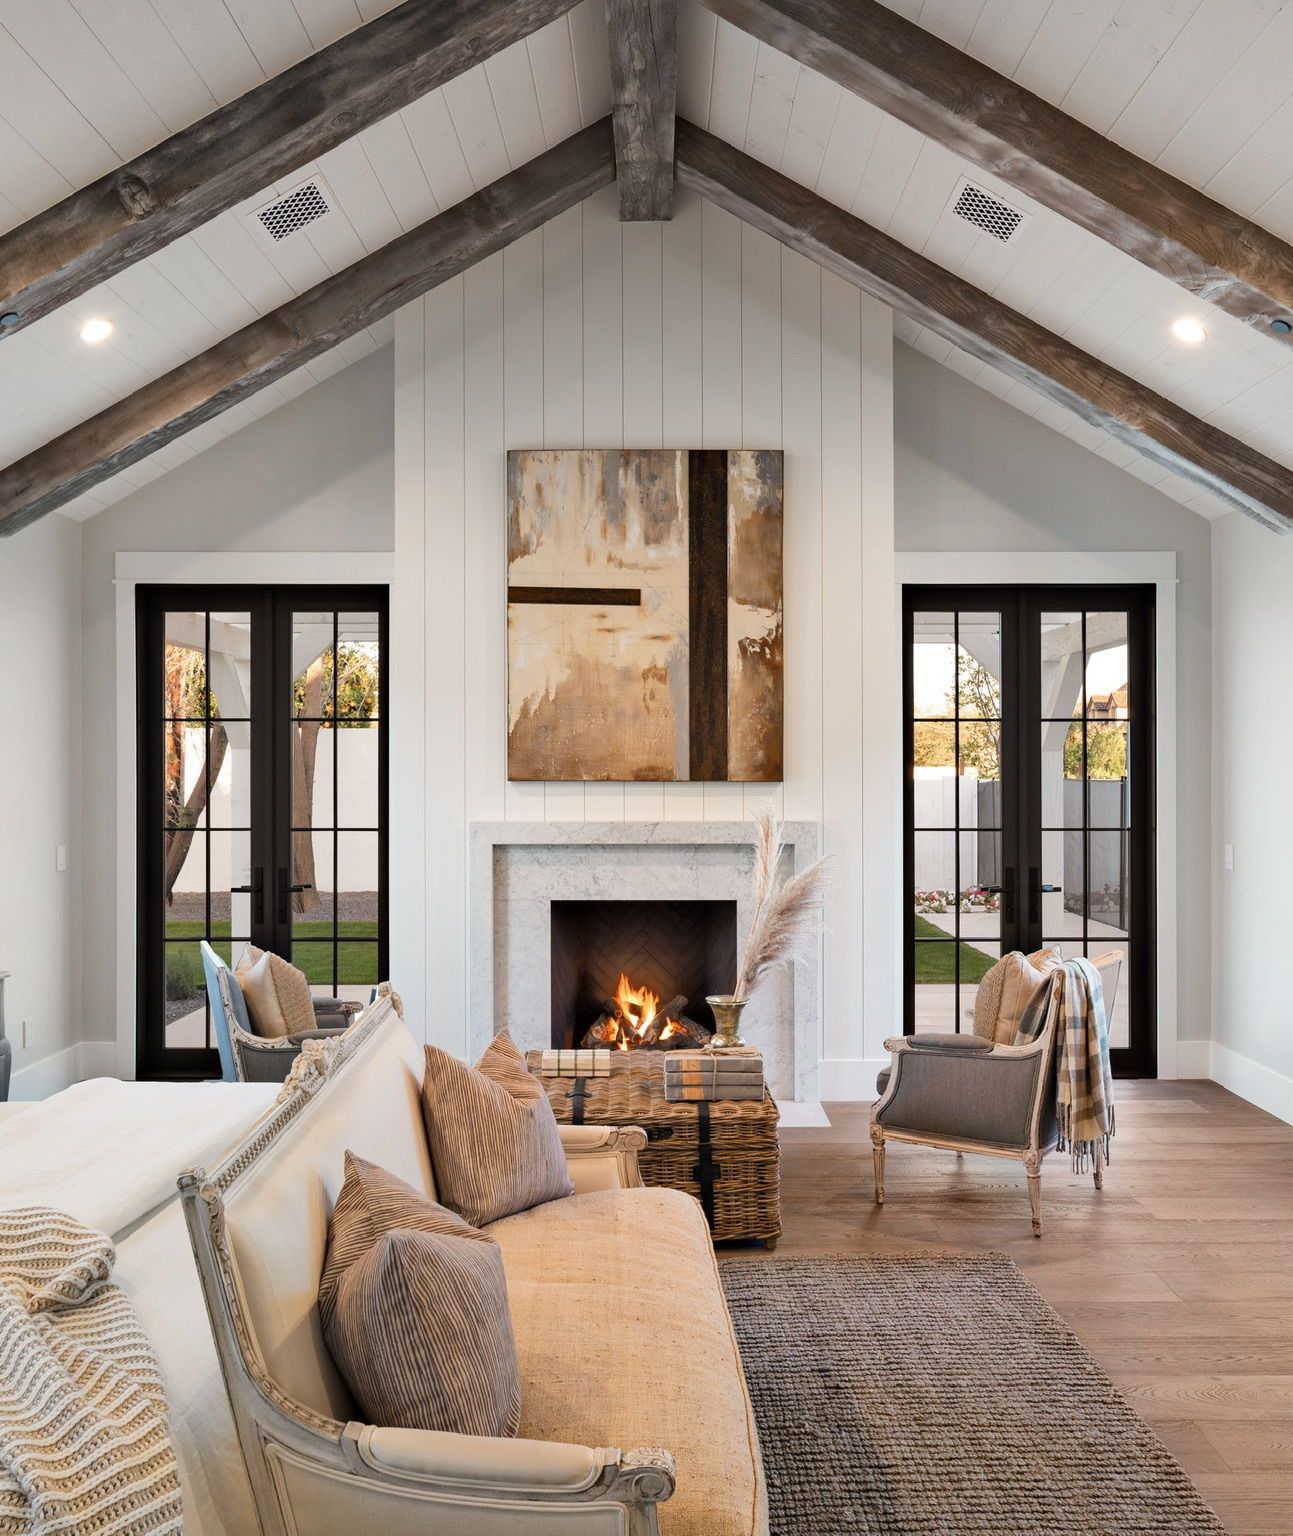 Master Bedroom Ideas Farmhouse Modern All The Cozy Bedroom Vibes With Ship Modern Farmhouse Master Bedroom Modern Farmhouse Bedroom Modern Farmhouse Interiors